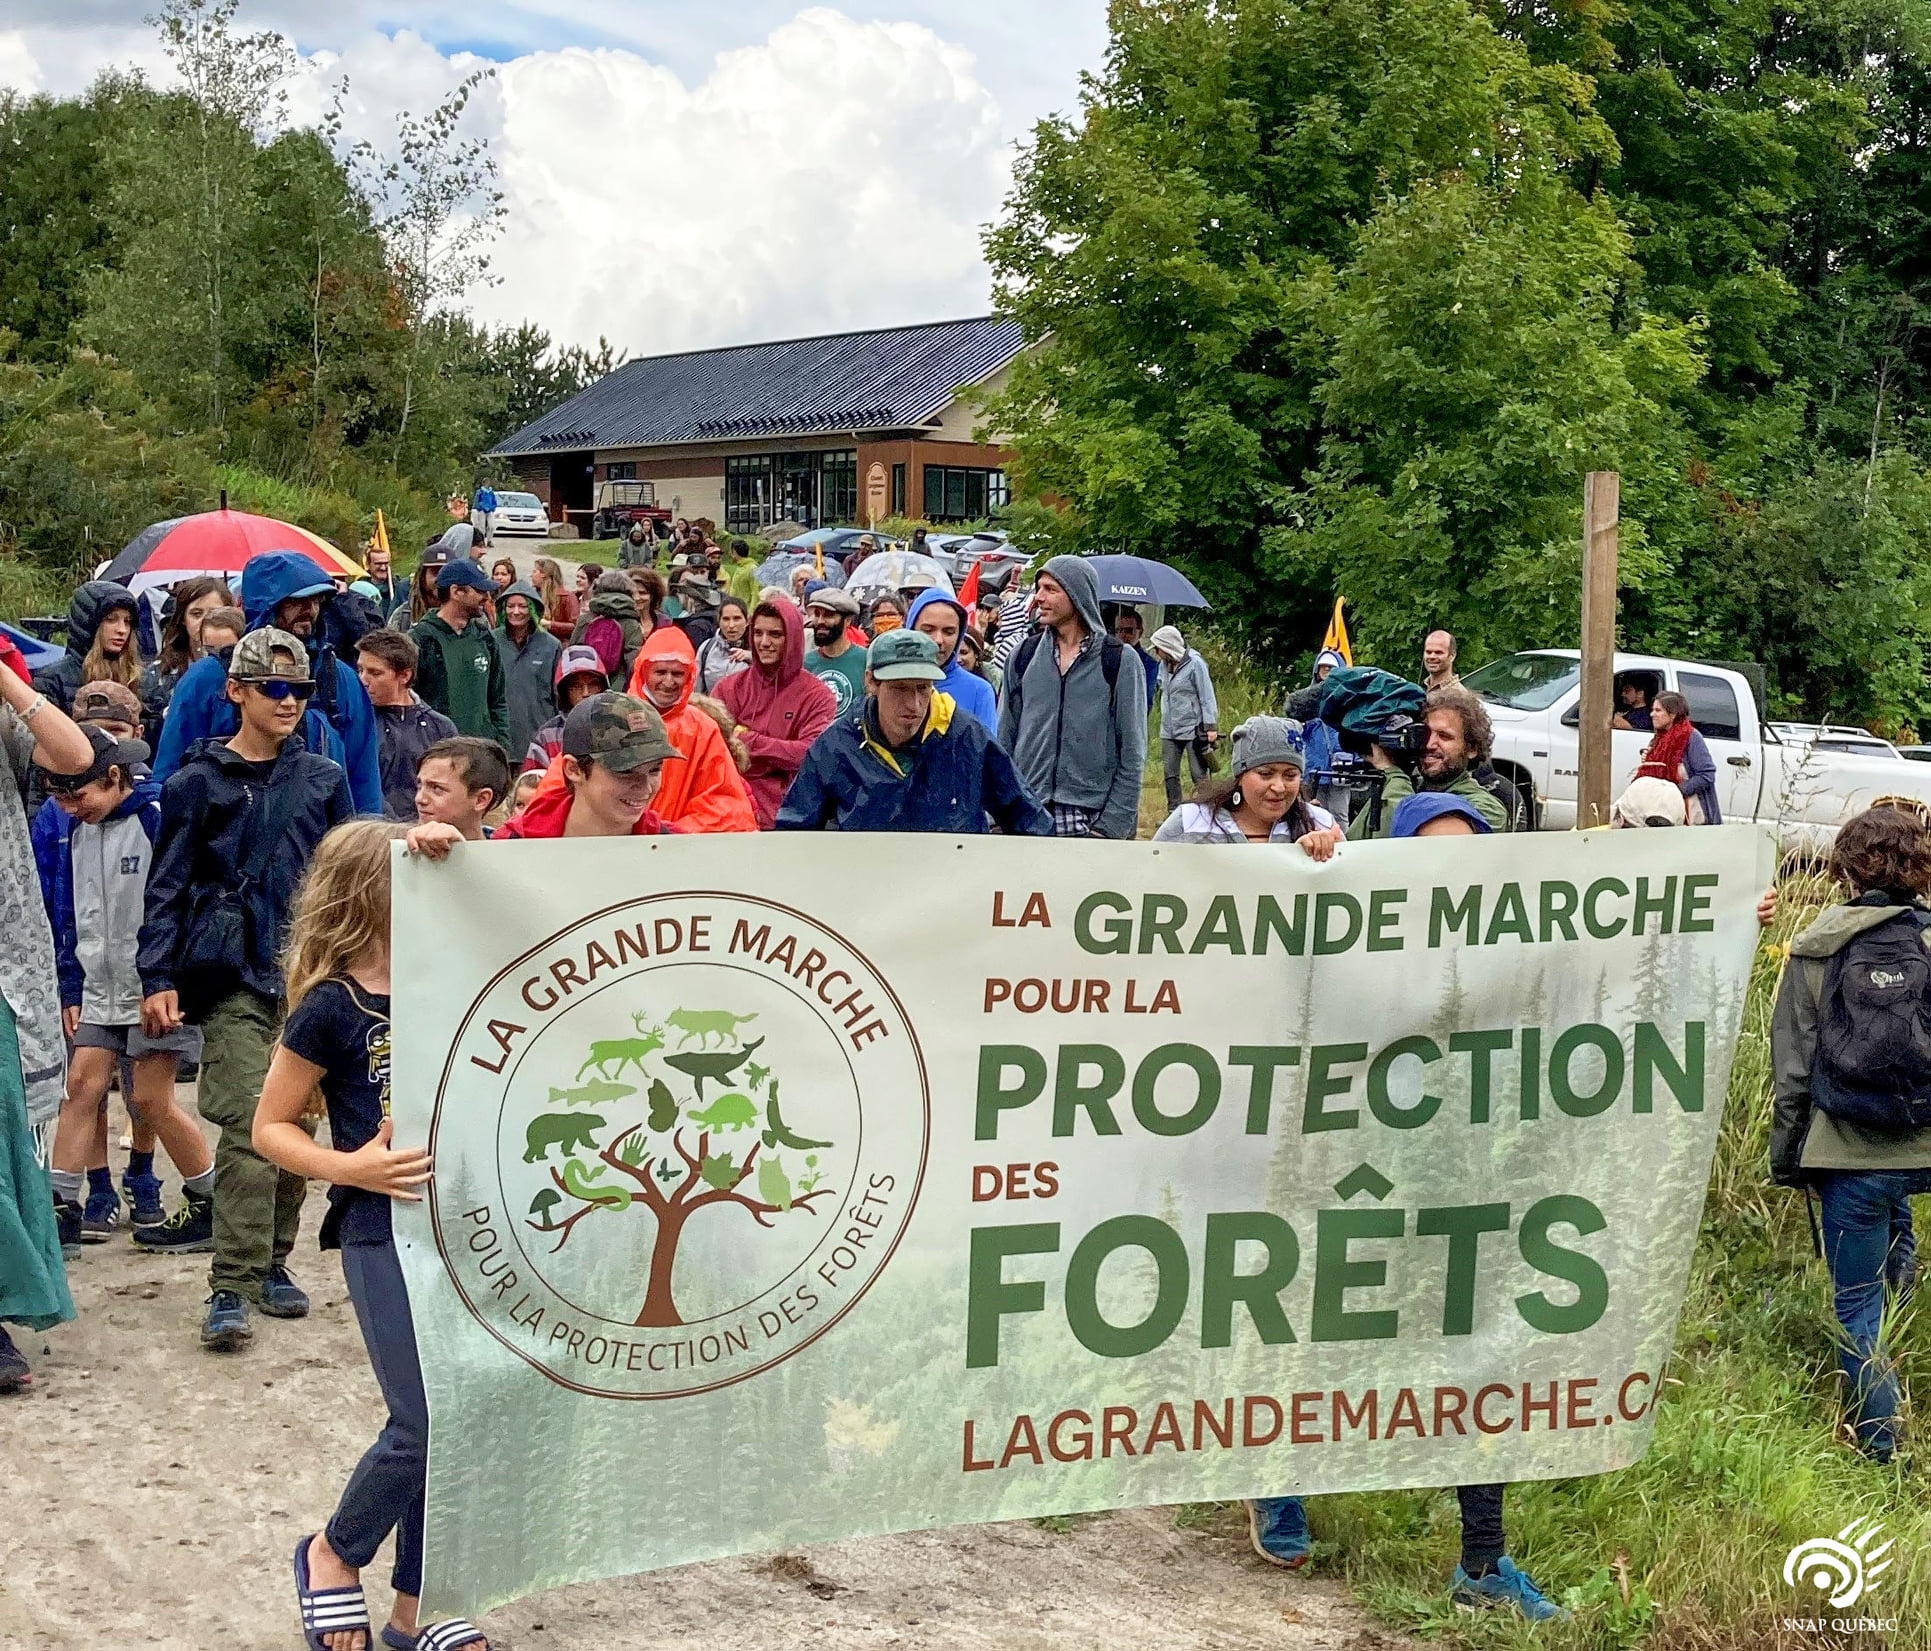 Grande marche protection des forêts